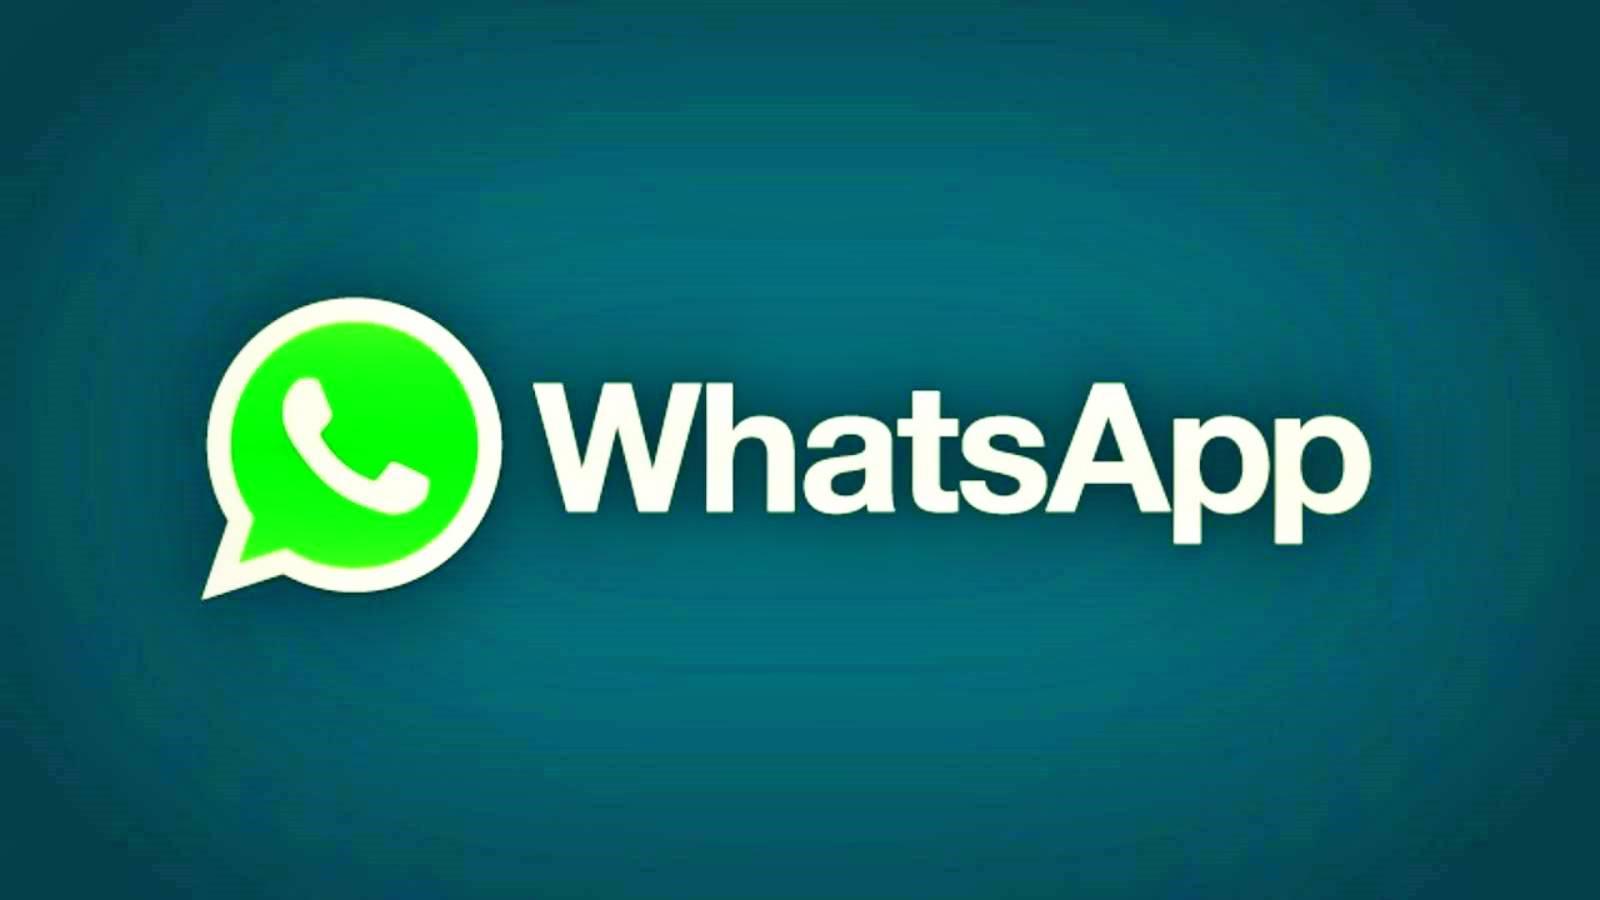 WhatsApp eficace